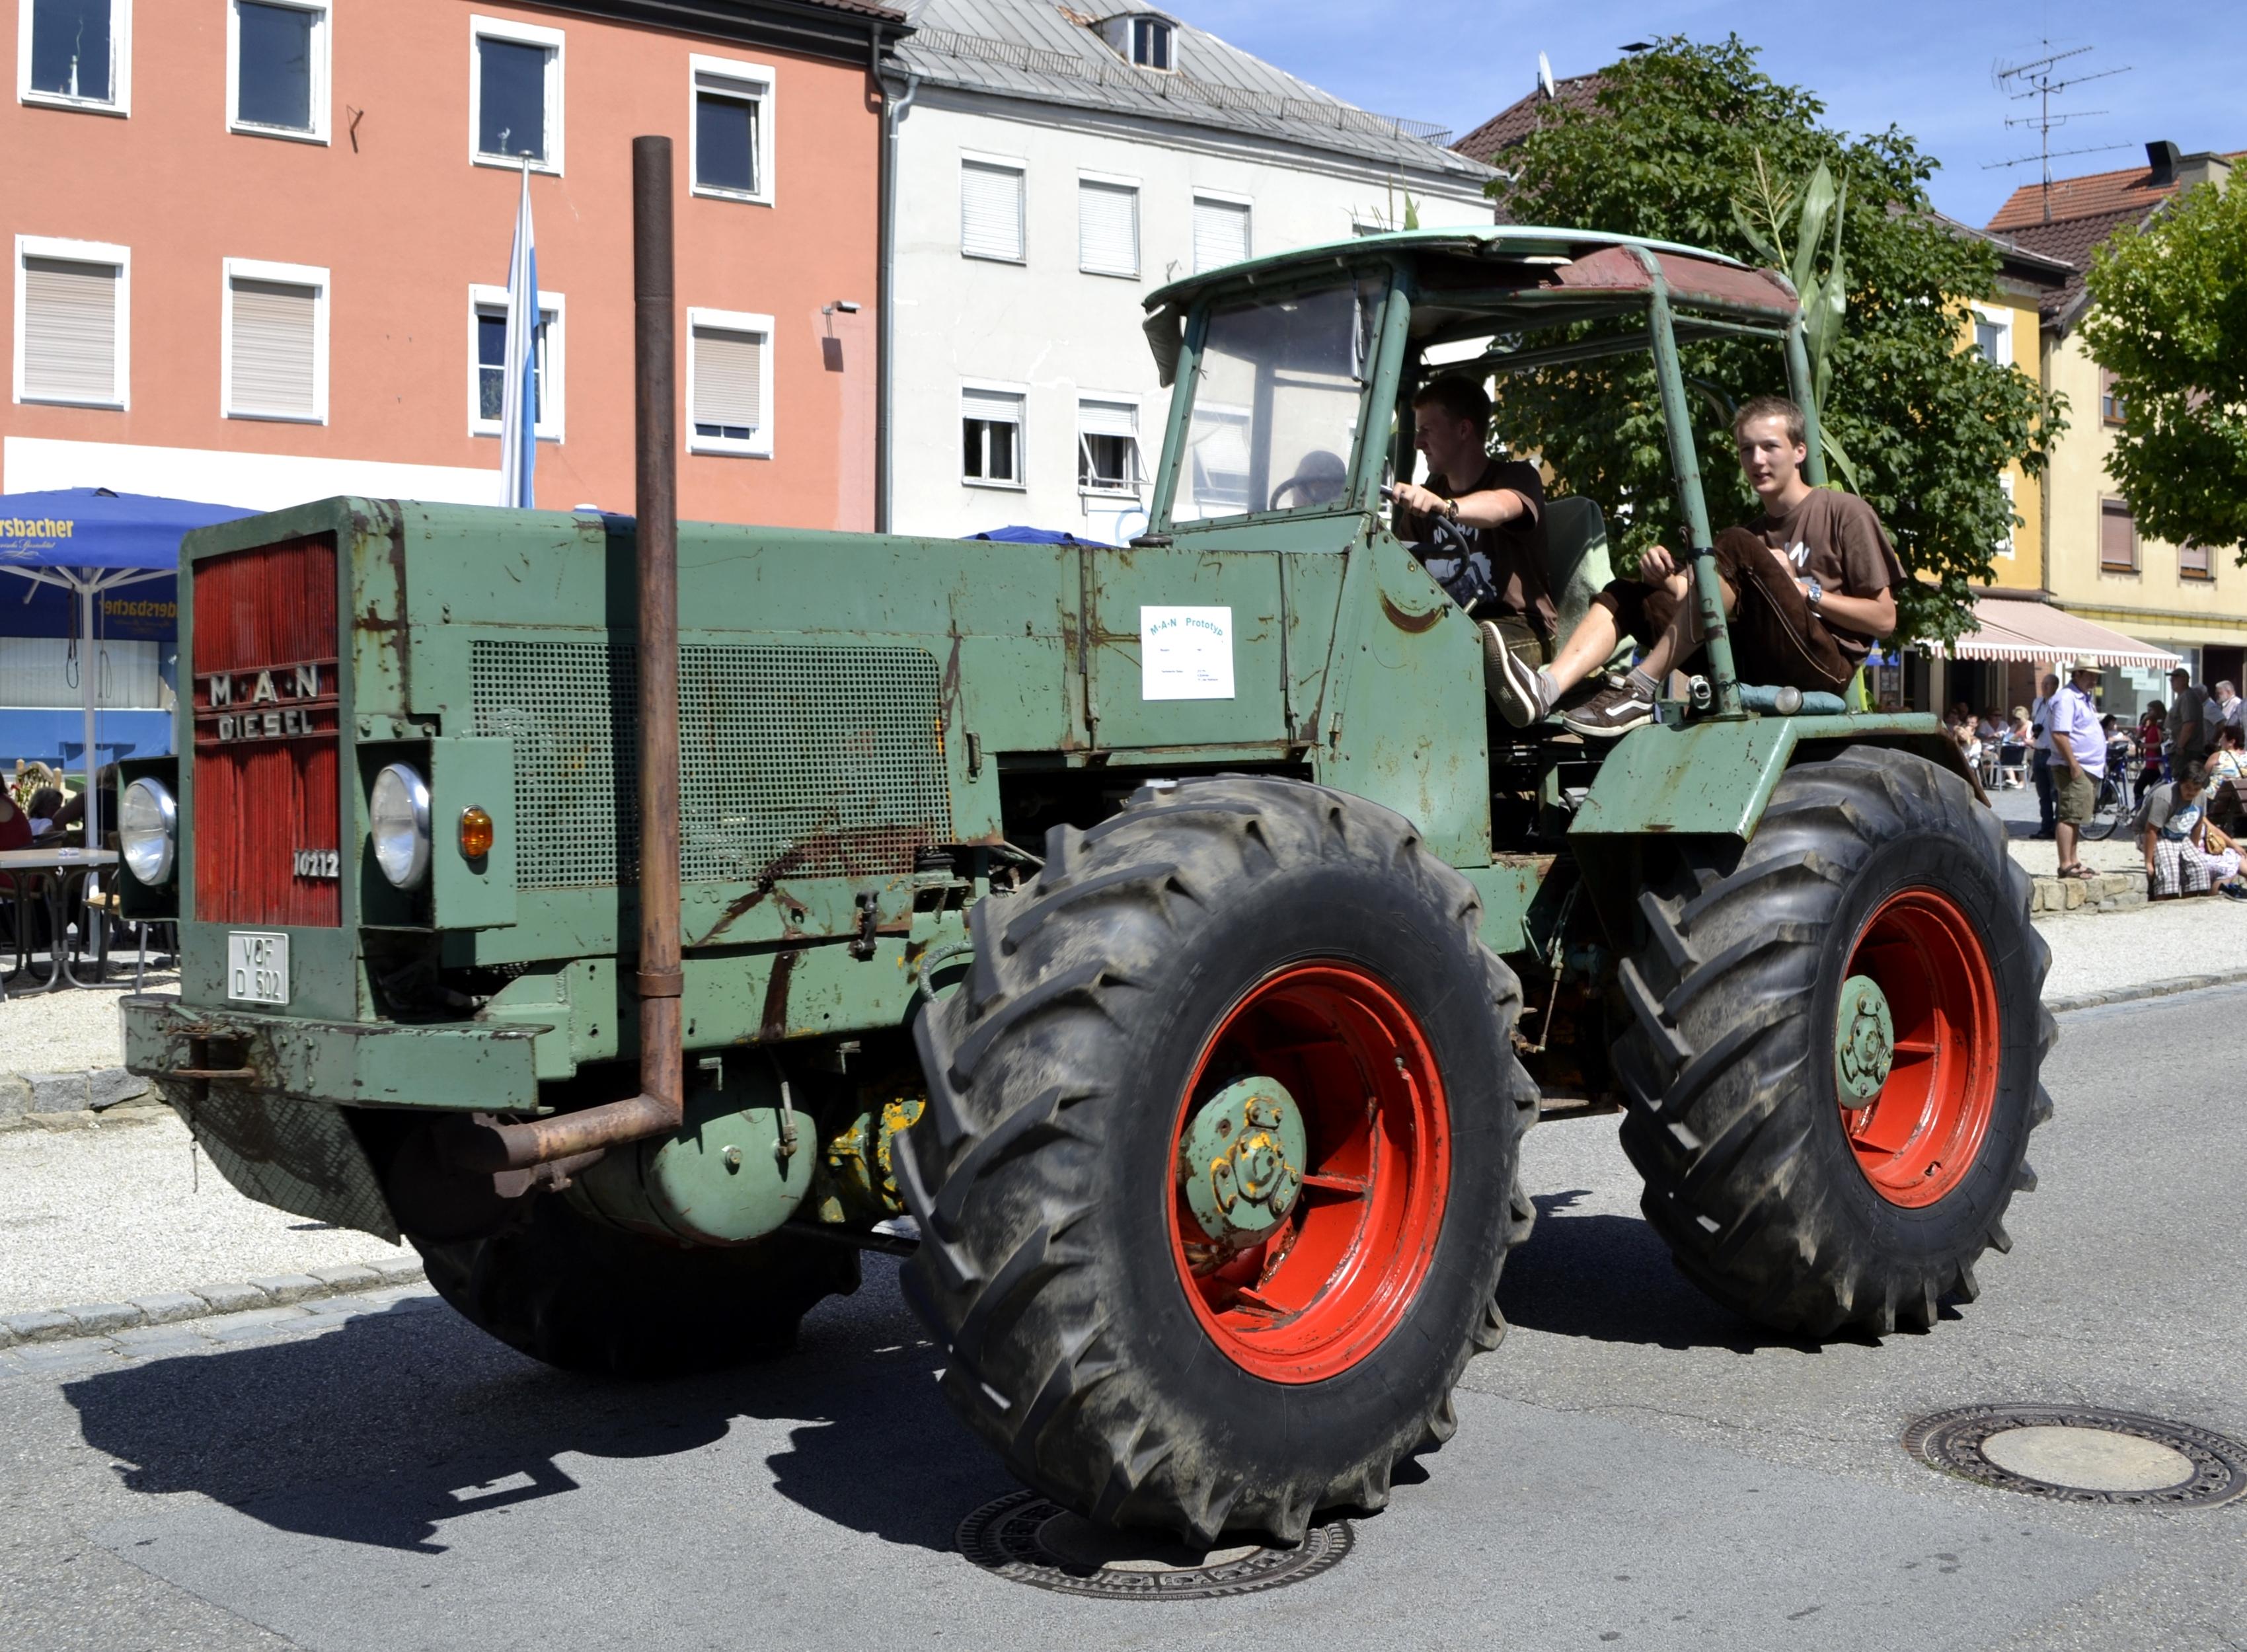 File:MAN Diesel 10212 Traktor Prototyp.JPG - Wikimedia Commons